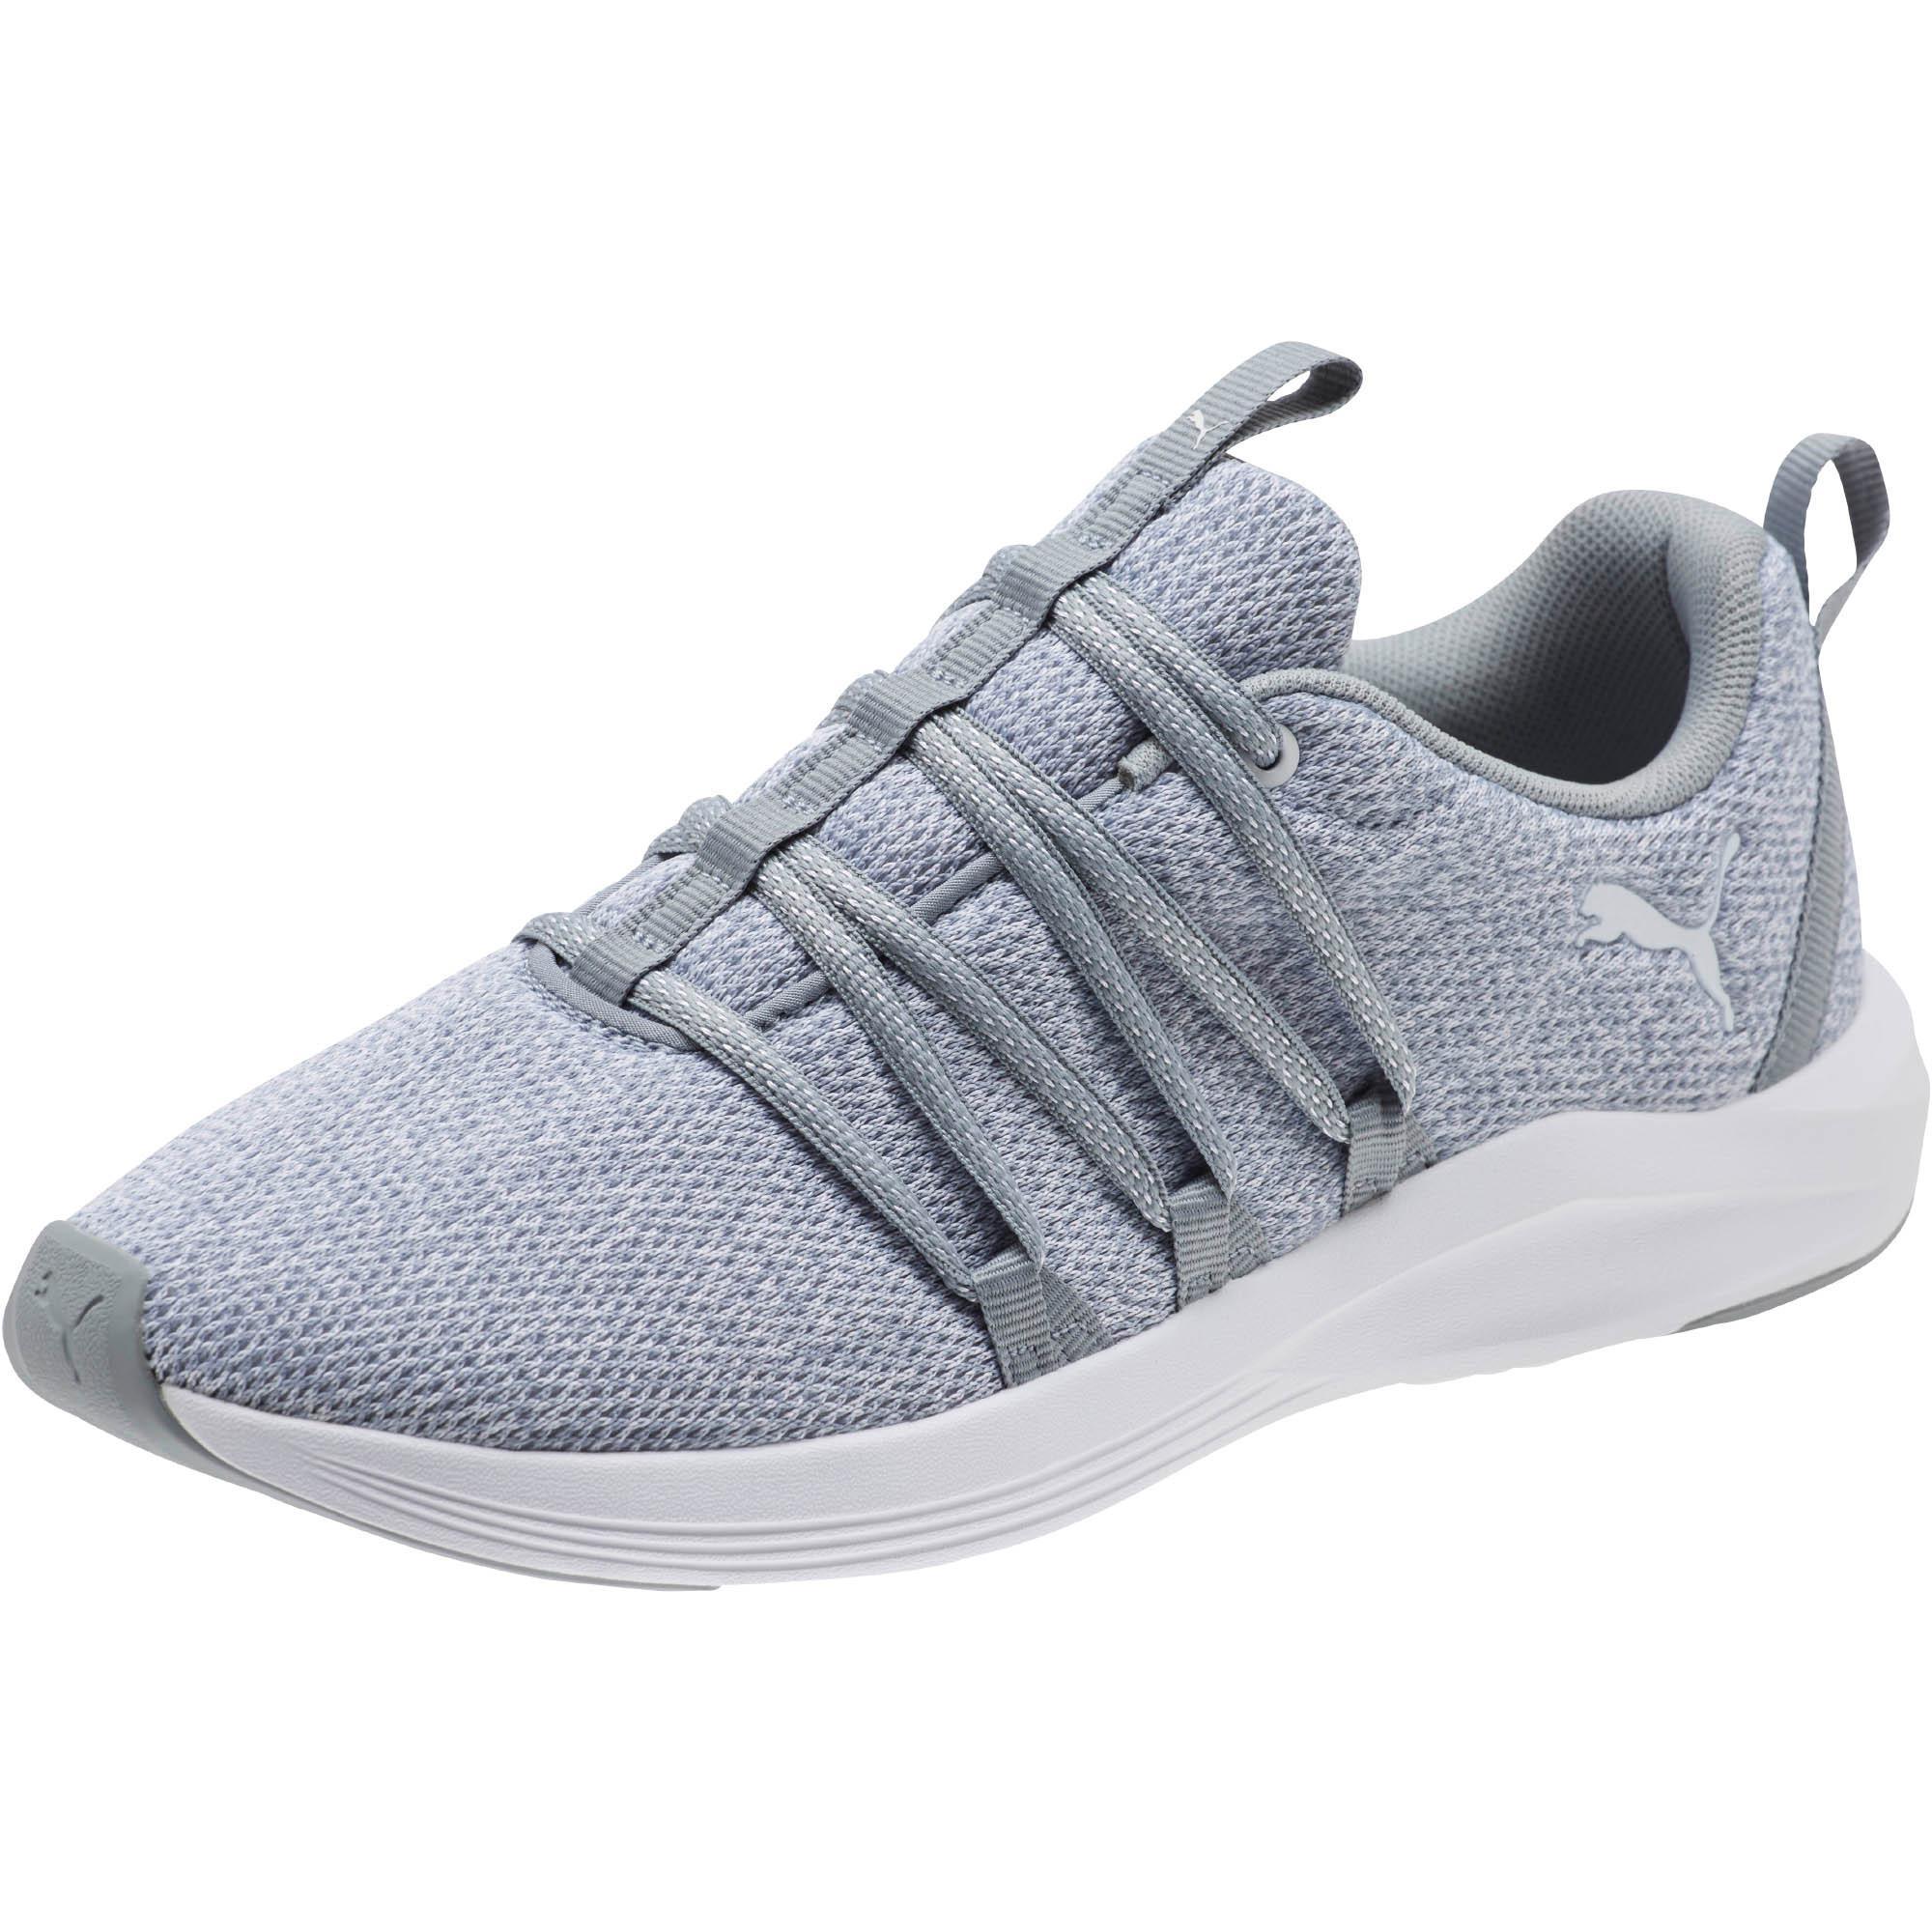 49e3ad98921132 Lyst - PUMA Prowl Alt Knit Multi Women s Sneakers